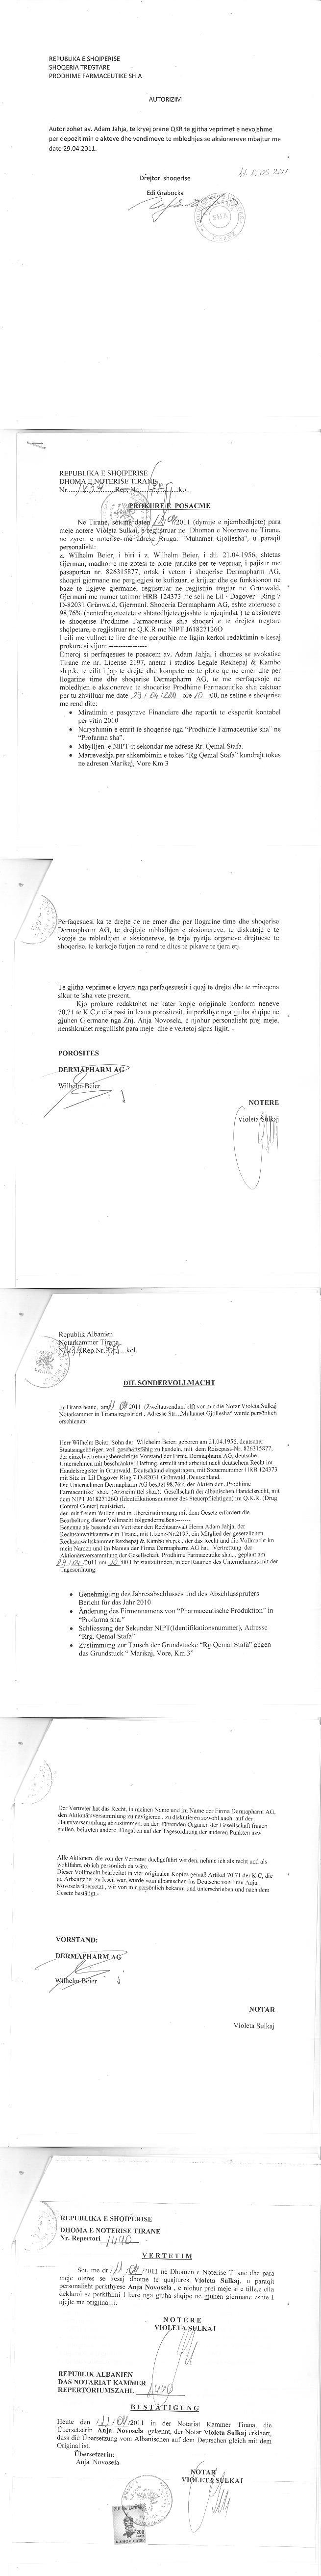 Modern Sondervollmachtsformular Pattern - FORTSETZUNG ARBEITSBLATT ...